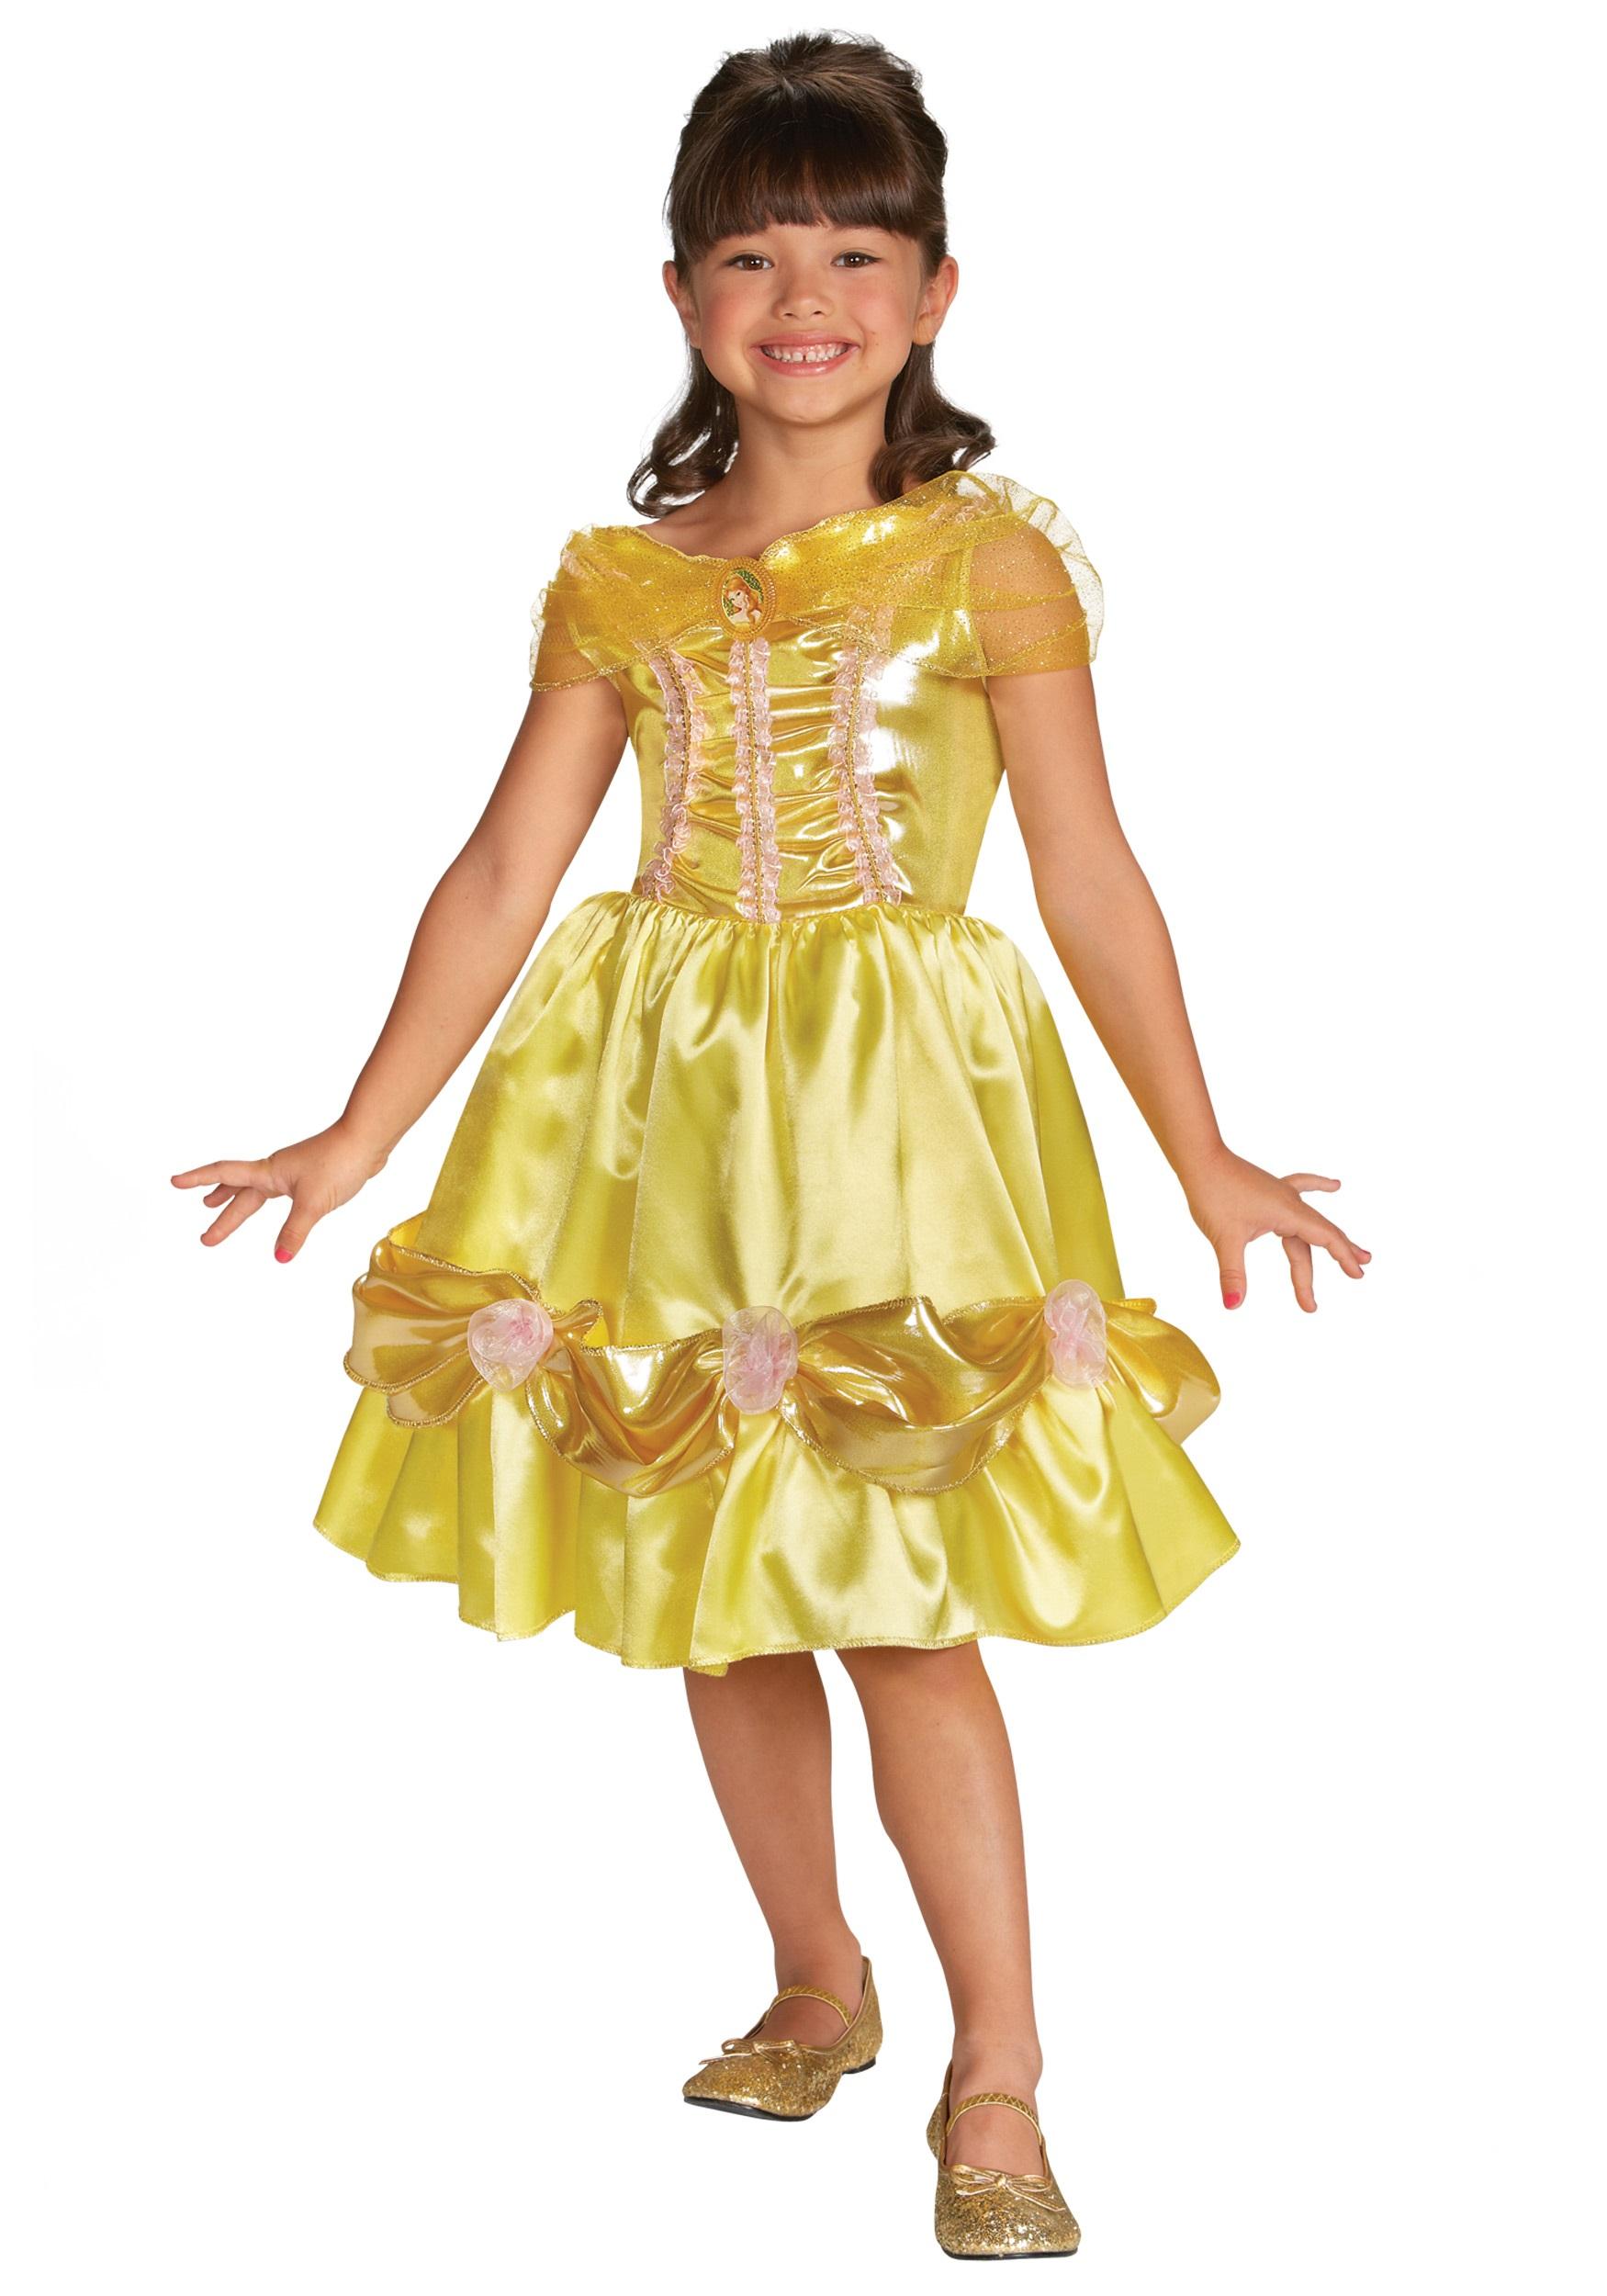 Girls Belle Sparkle Classic Costume  sc 1 st  Halloween Costumes & Girls Belle Sparkle Classic Costume - Halloween Costumes